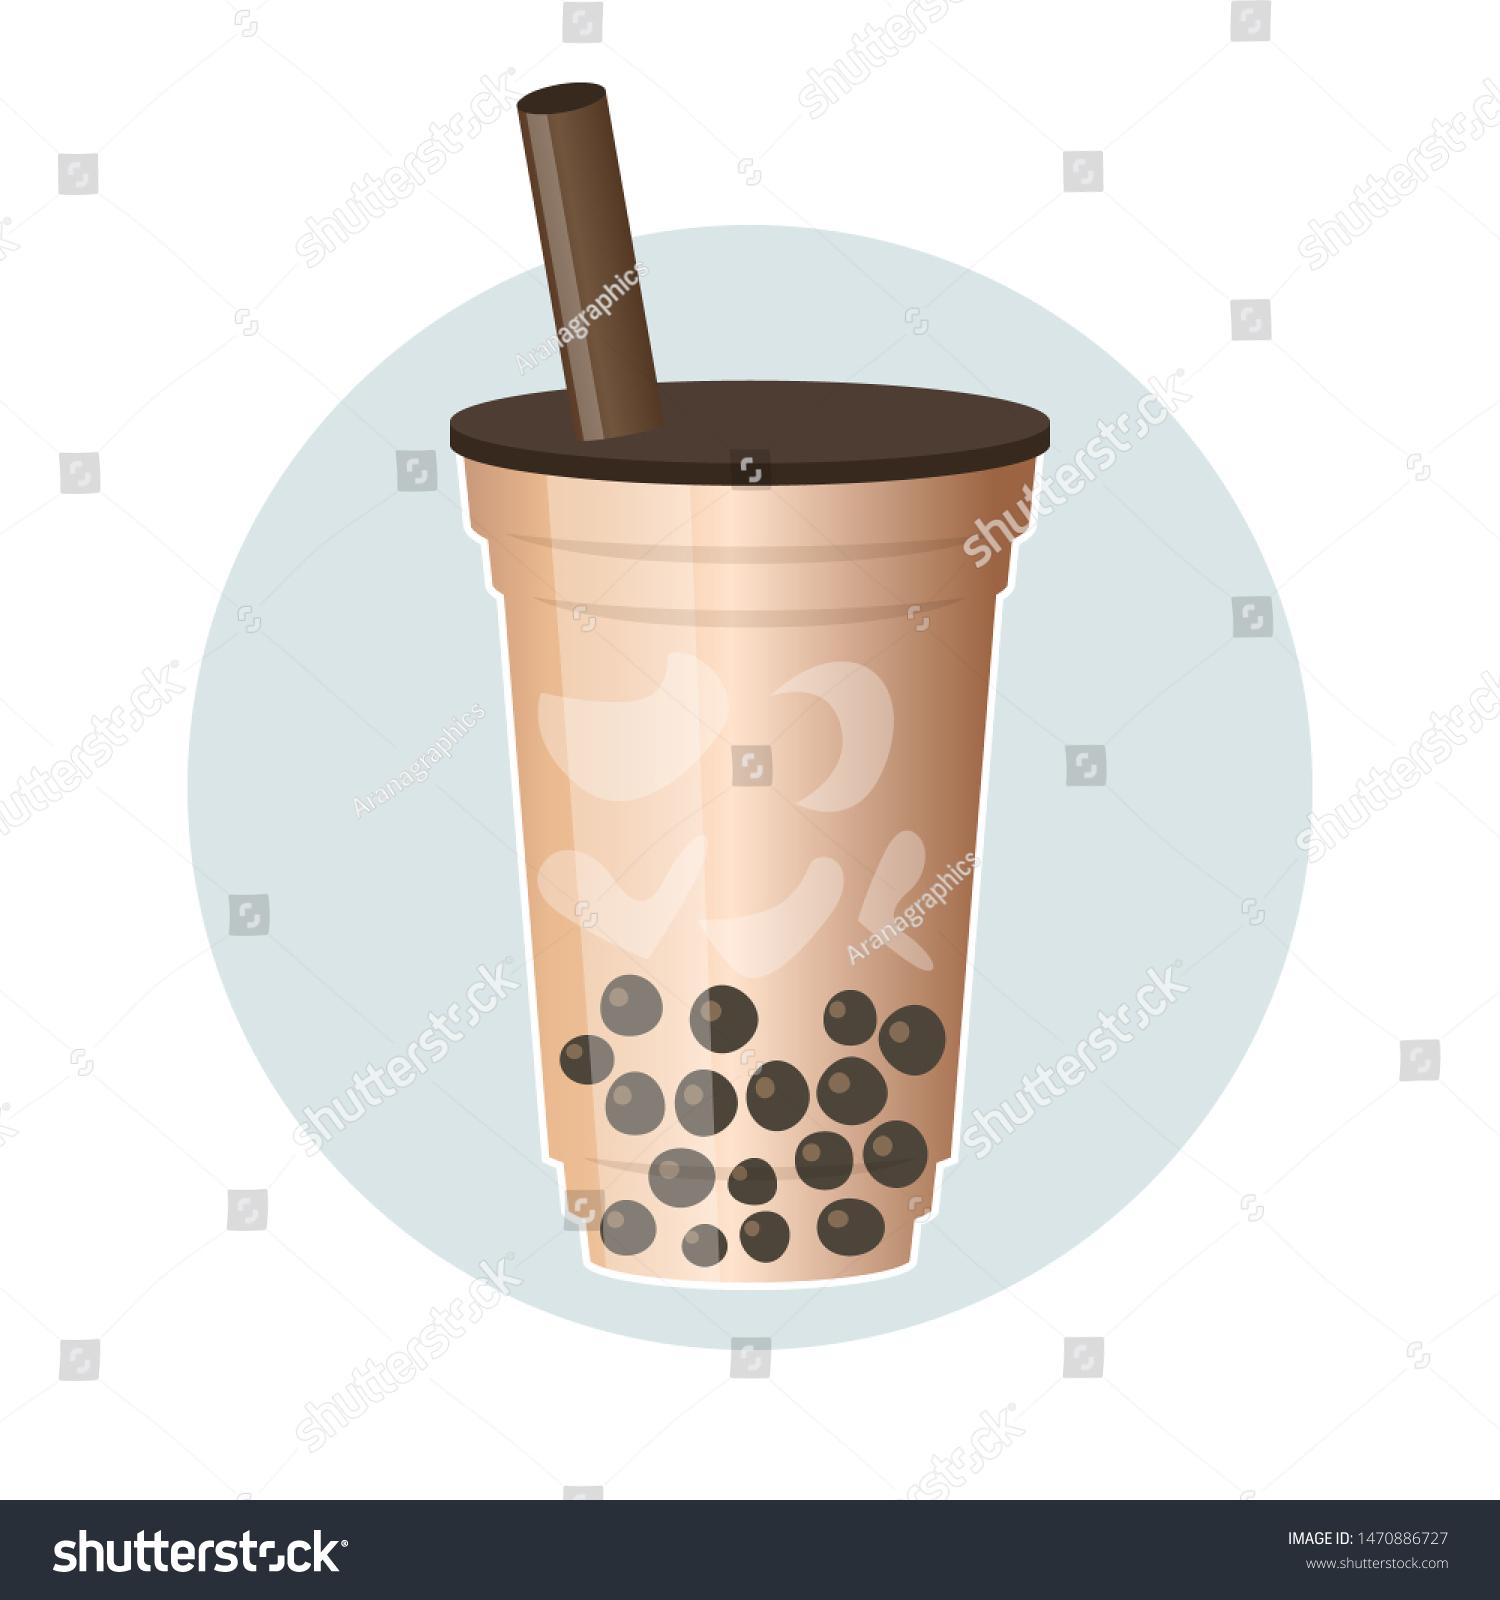 bubble tea pearl milk tea vector stock vector royalty free 1470886727 https www shutterstock com image vector bubble tea pearl milk vector illustration 1470886727